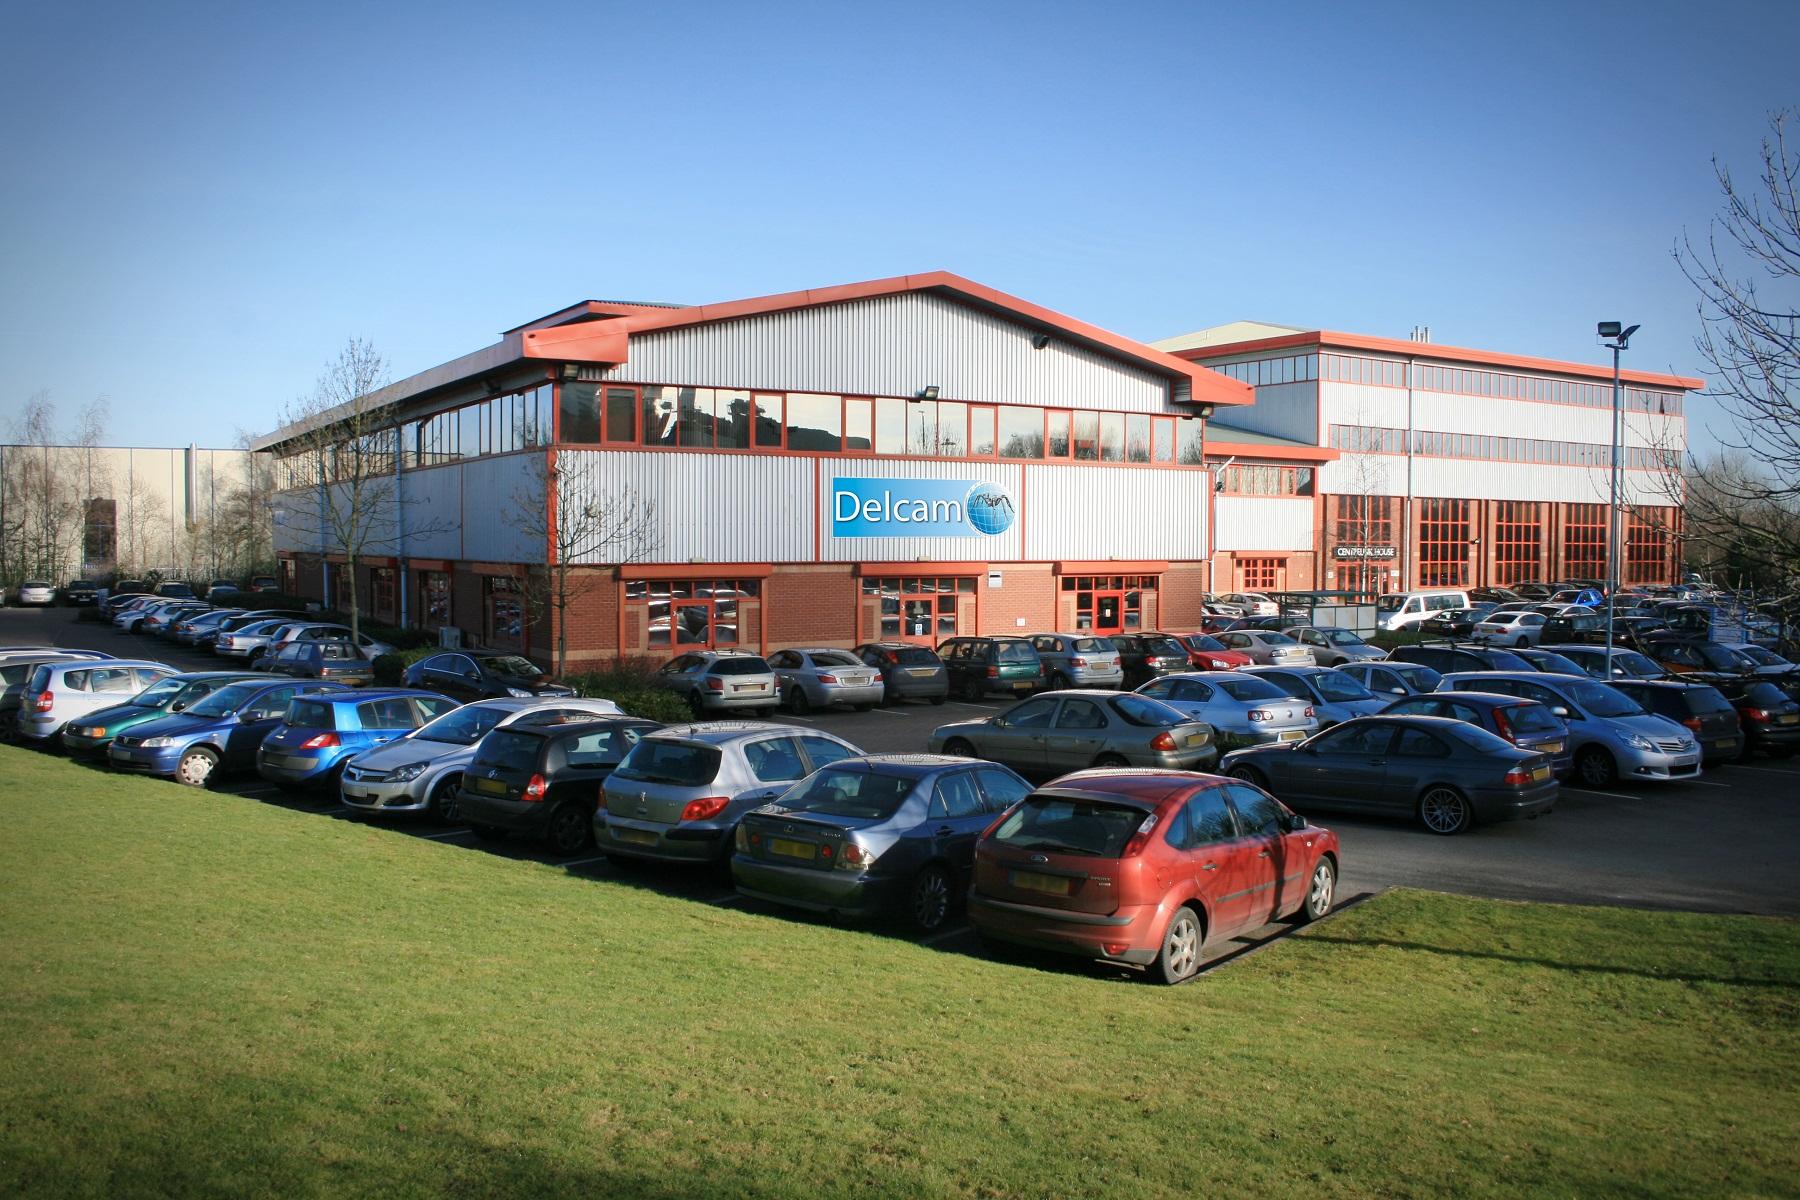 Autodesk announces intention to acquire Delcam